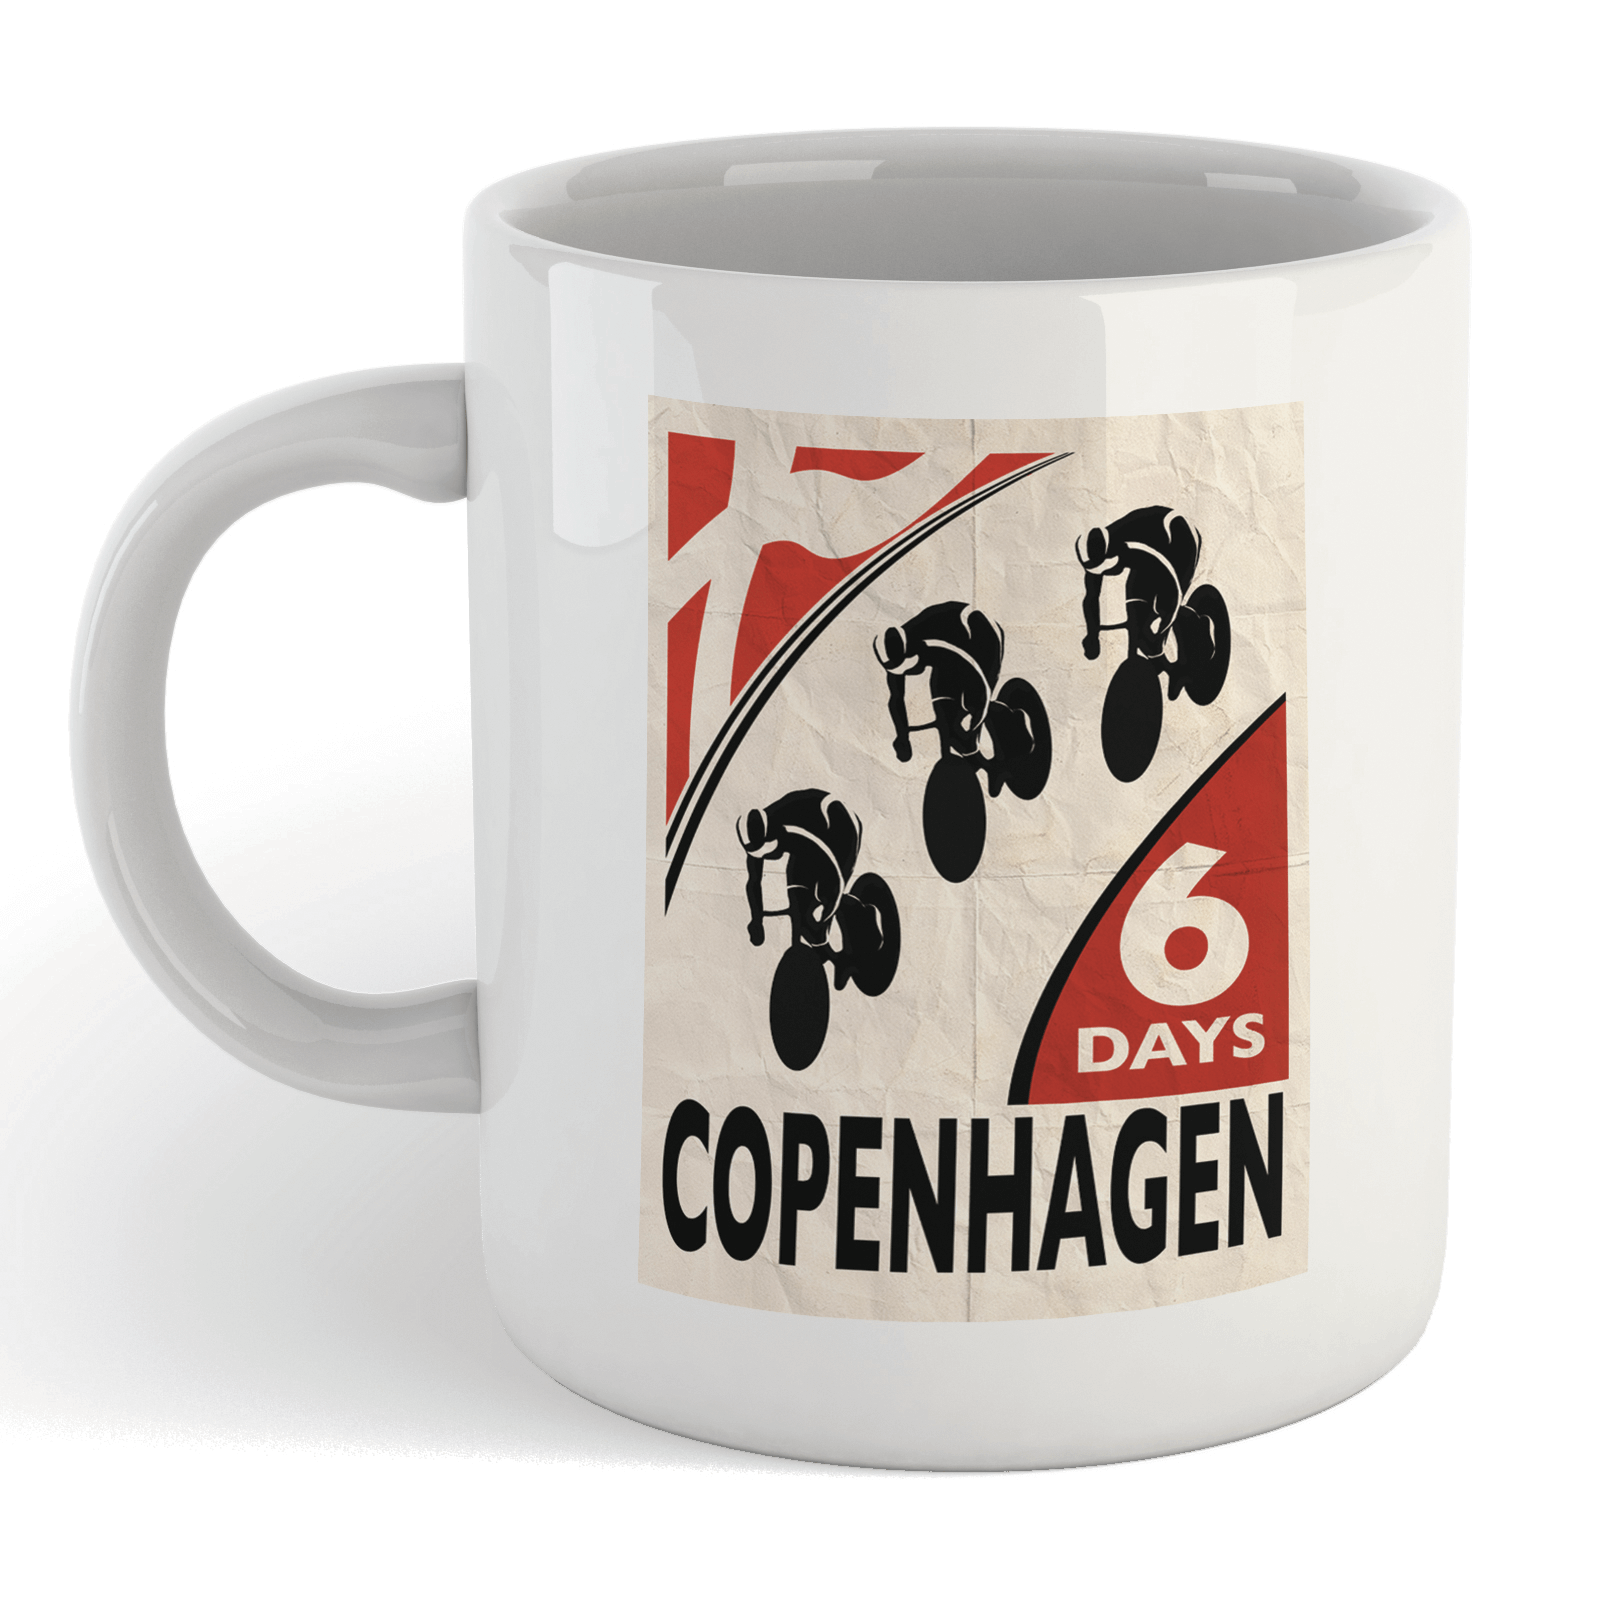 Six Days Copenhagen Mug